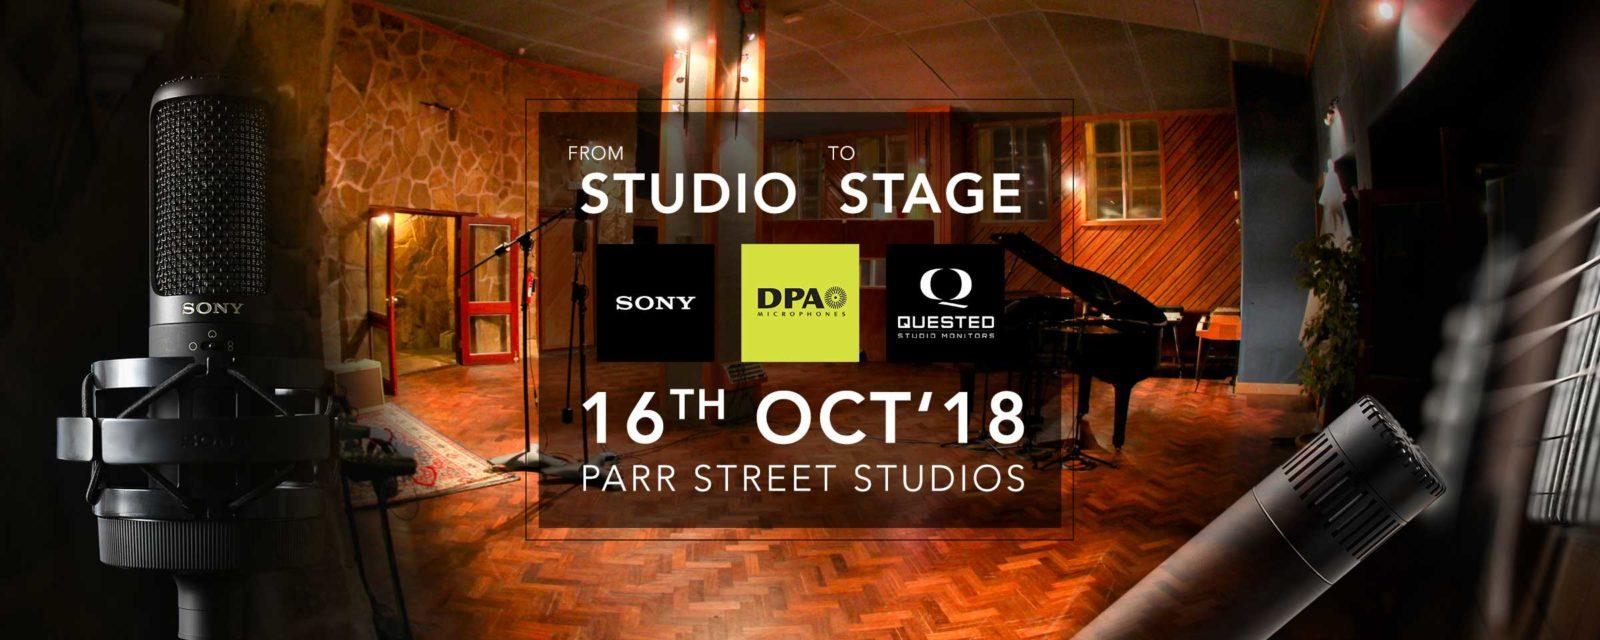 Parr Street Studios 16 October 2016